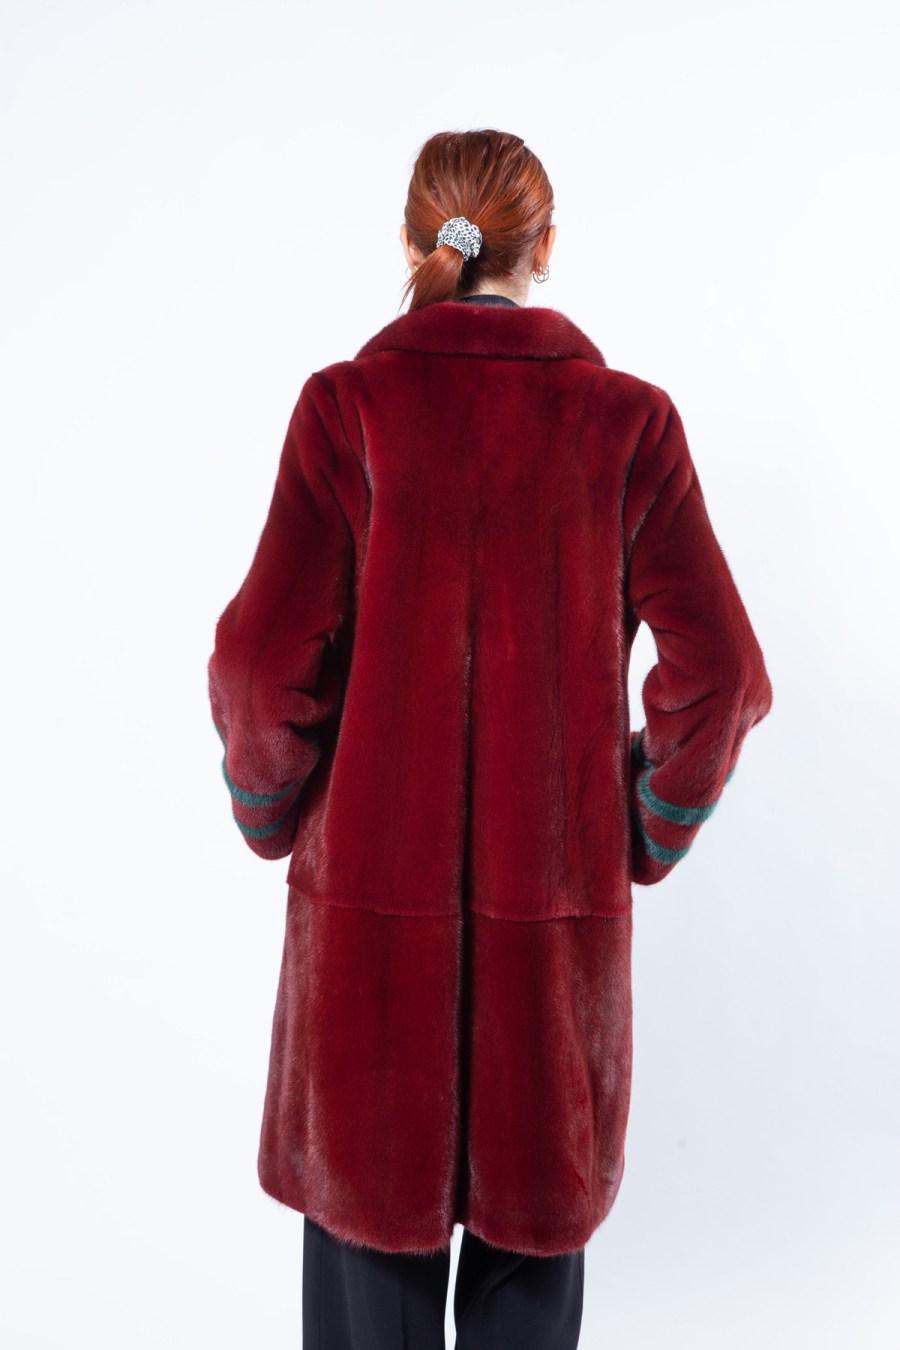 Passion Red Mink Coat with english collar   Sarigianni Furs